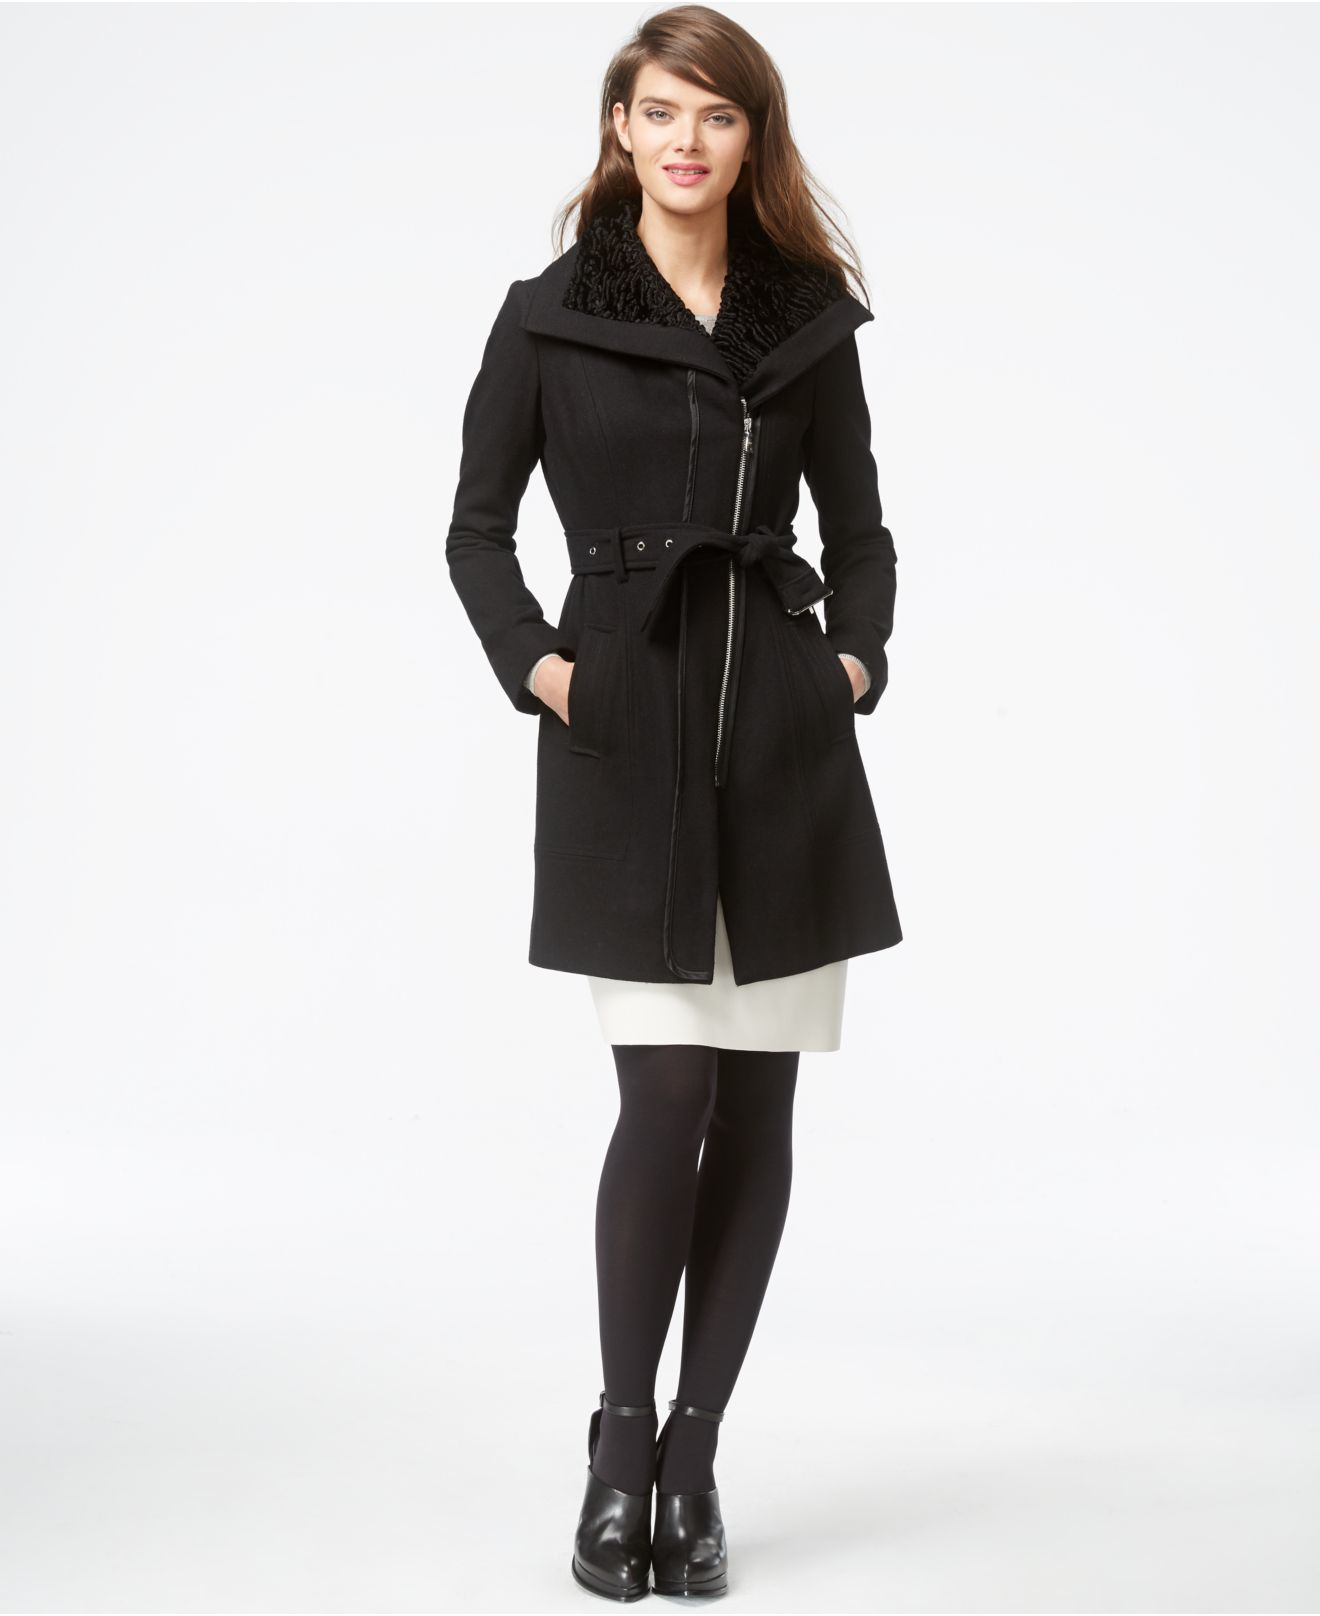 57461b3f6e63 Lyst - Guess Faux-fur-collar Asymmetrical-zip Coat in Black